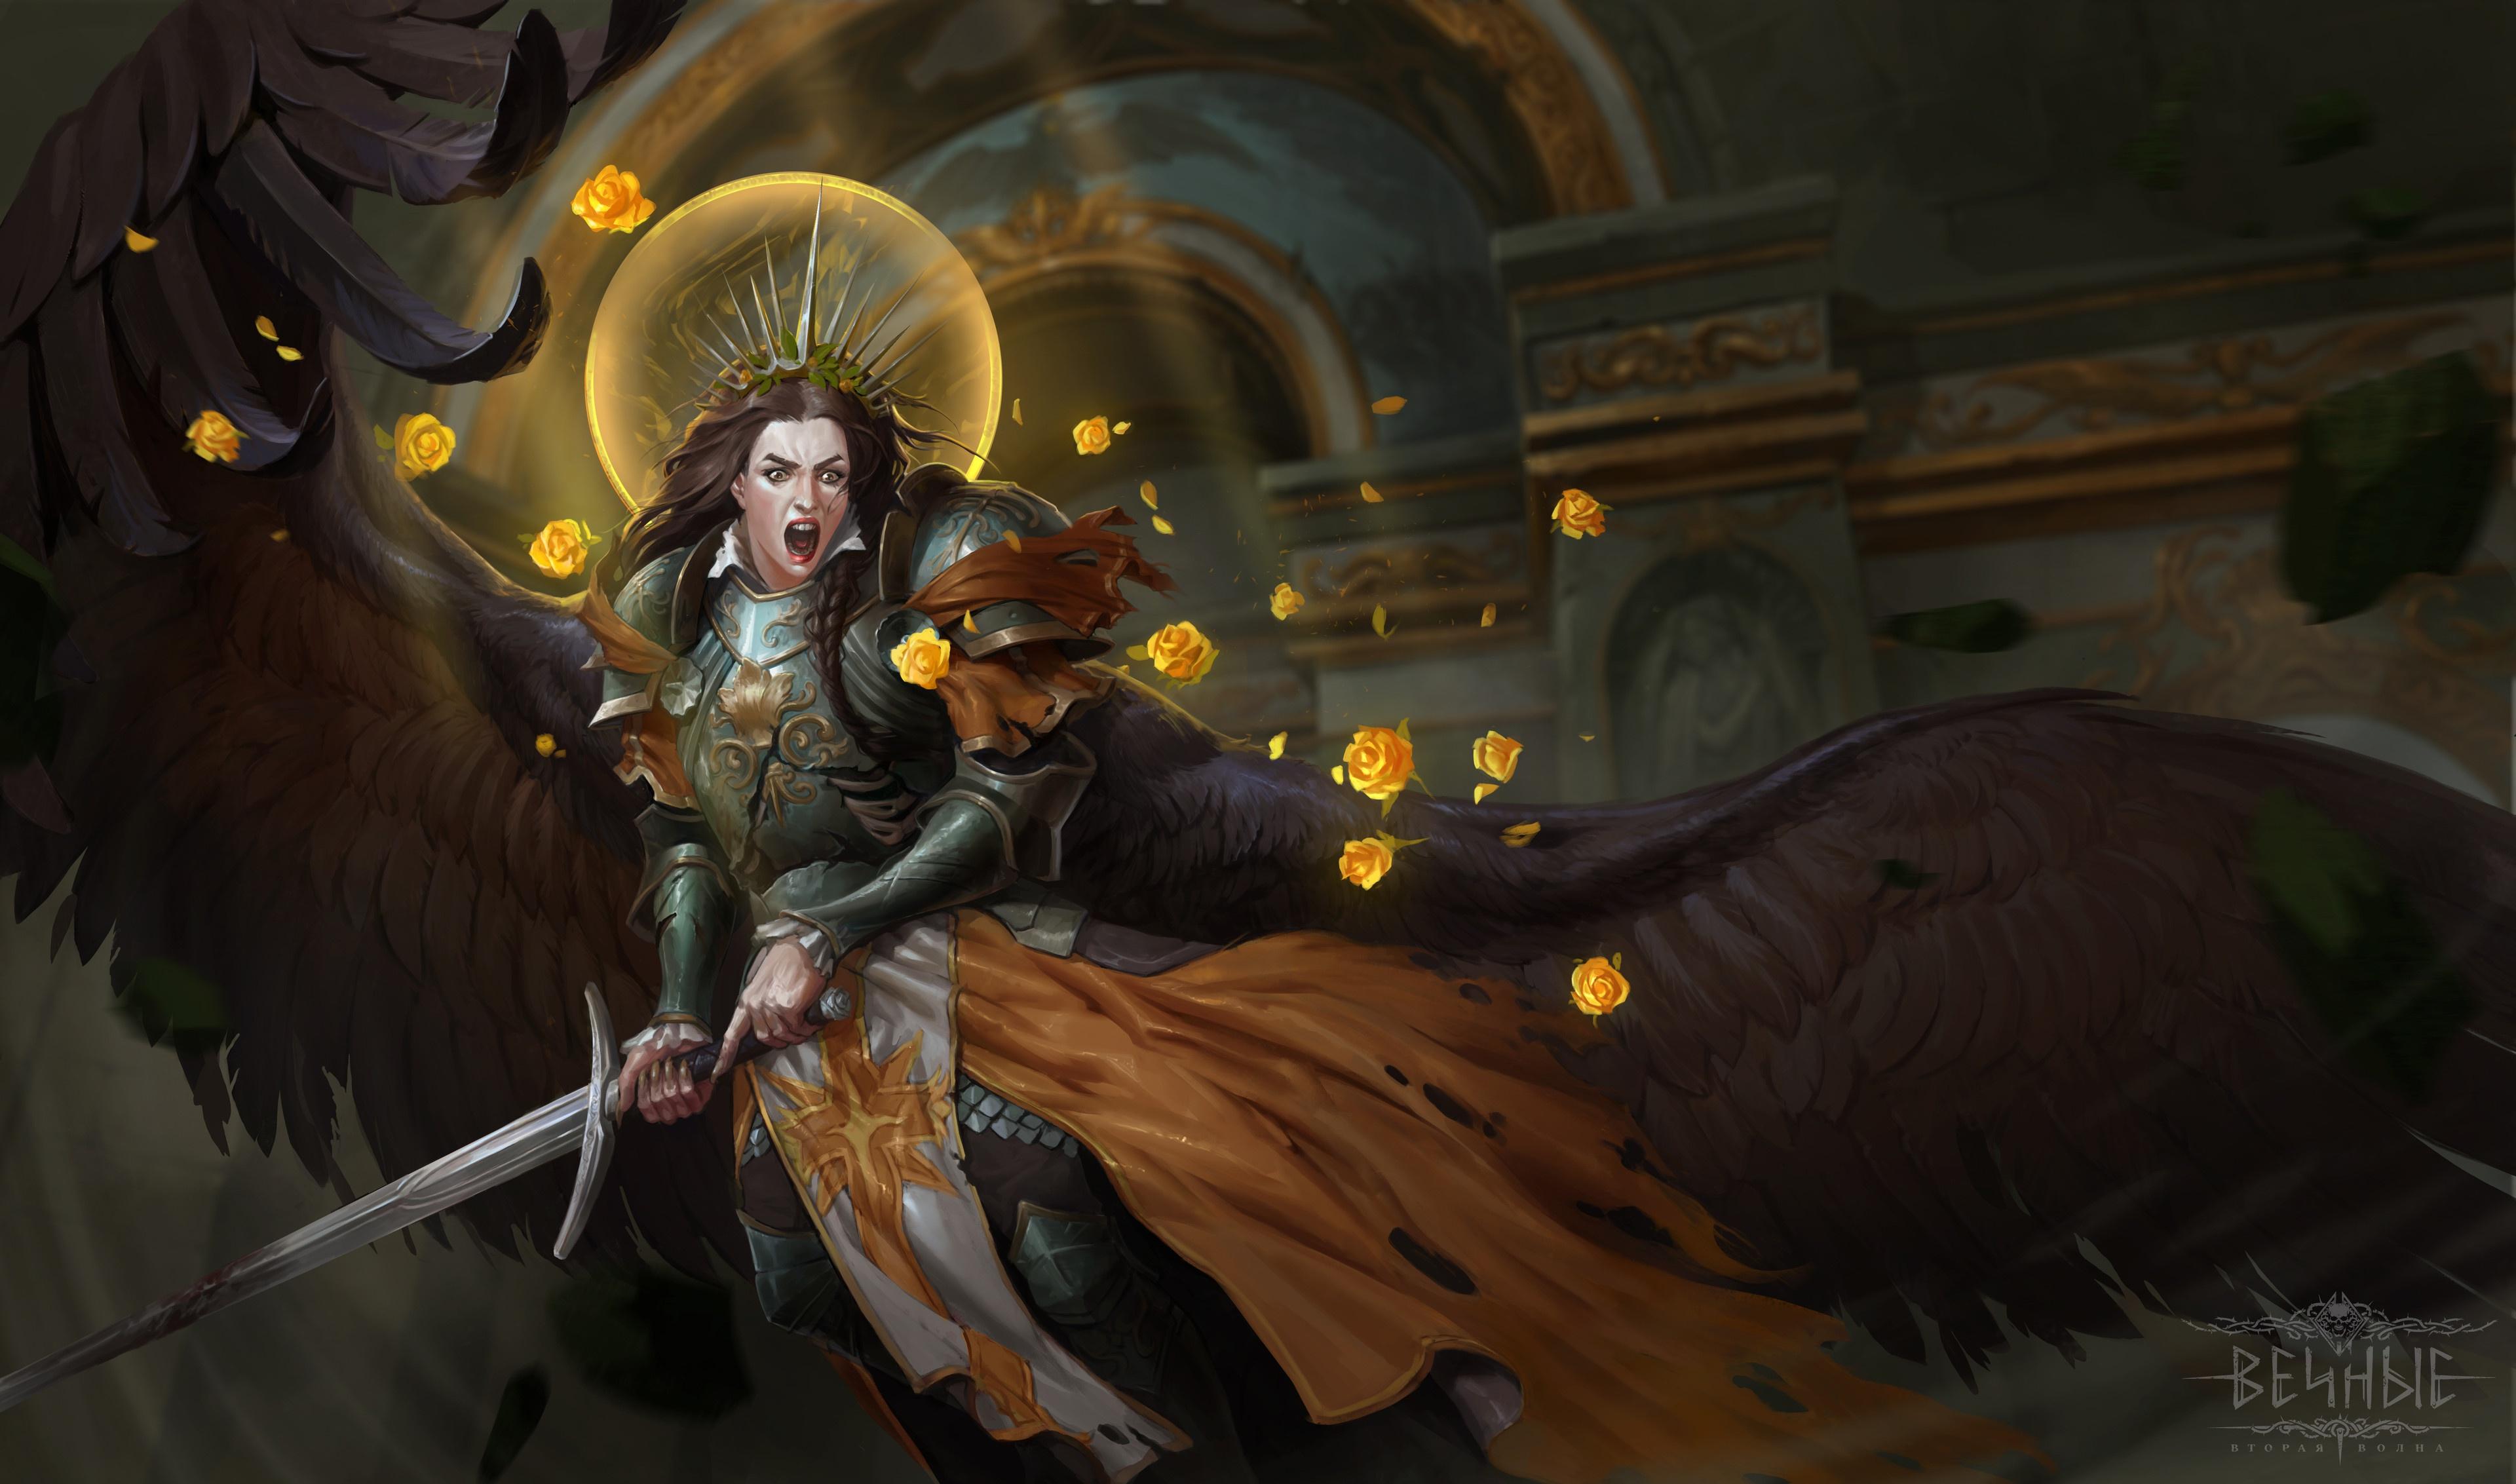 General 3840x2265 girls with swords fantasy art ArtStation fantasy girl wings open mouth sword